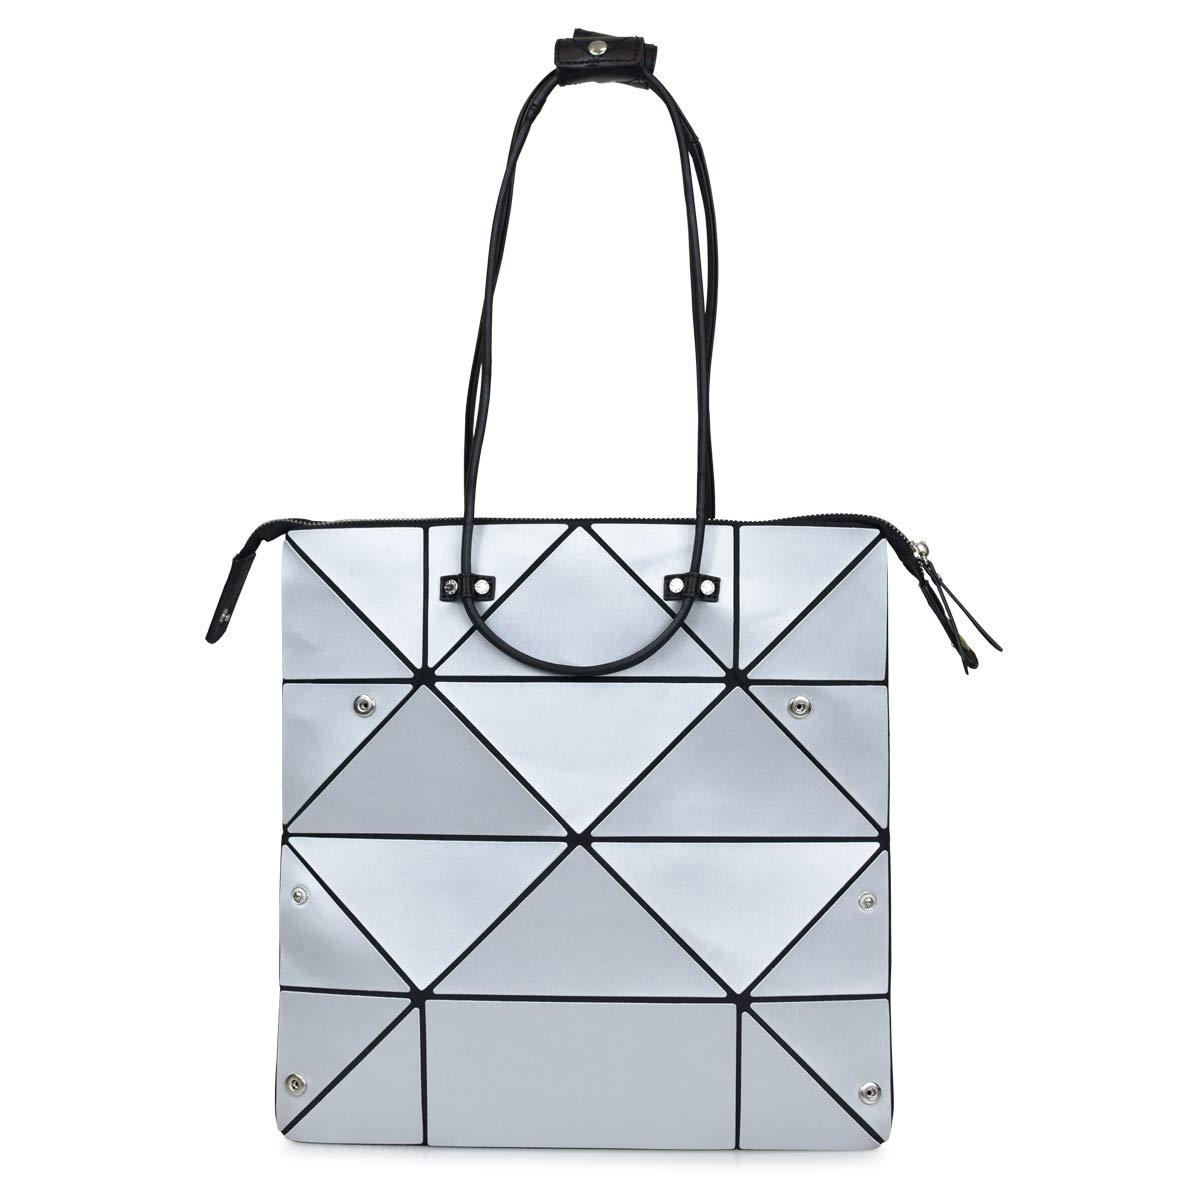 Hanaa-fu Womens Handbag Aries Neo Origami Transforming Bag Silver by Hanaa-fu